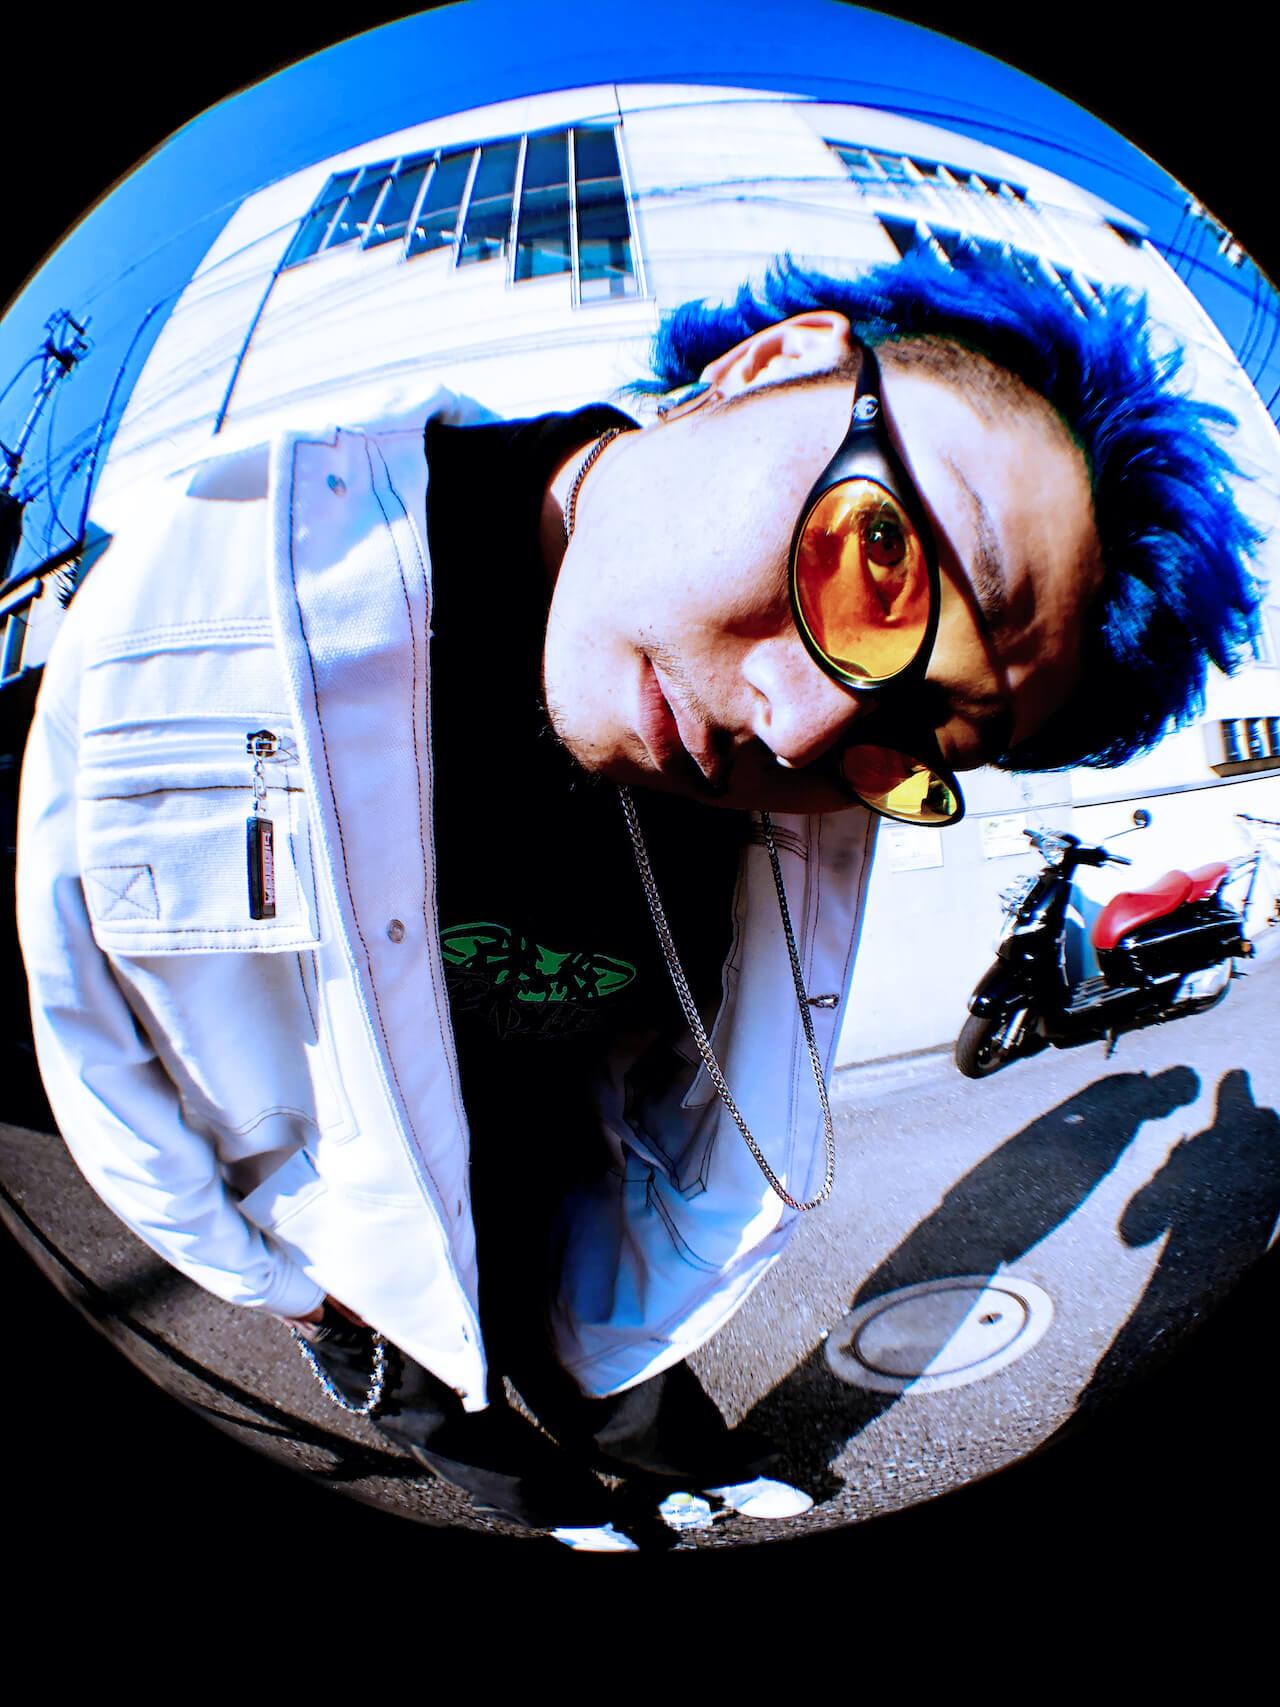 gato × JUBEE ×(sic)boyの3マンイベントが開催 加えてKMがDJ、BEAT LIVEを披露 music201225-gato-jubee-sicboy-4